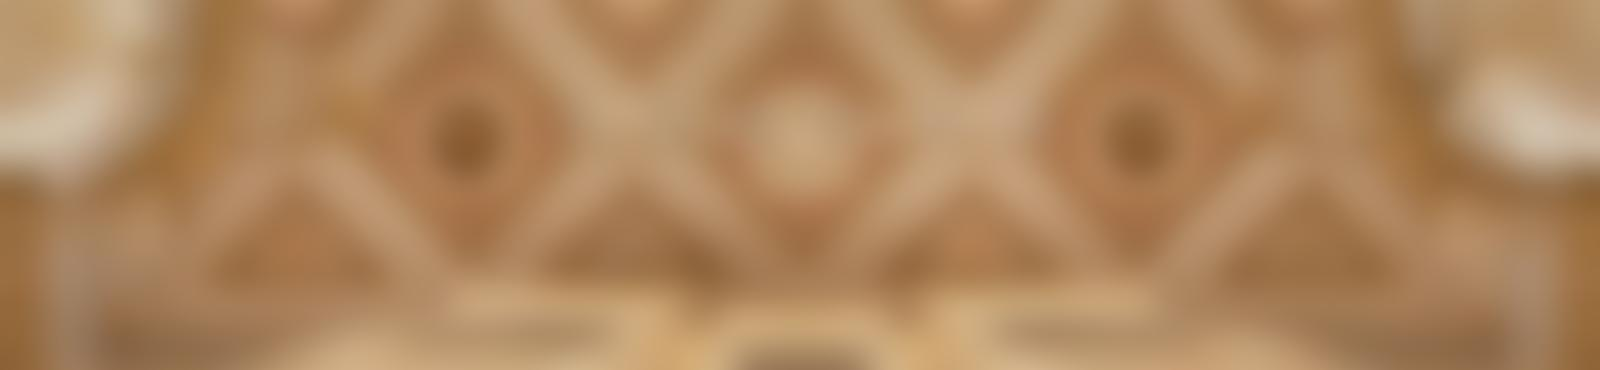 Blurred ae7042f6 ab57 4a5c b5db e778438012a5